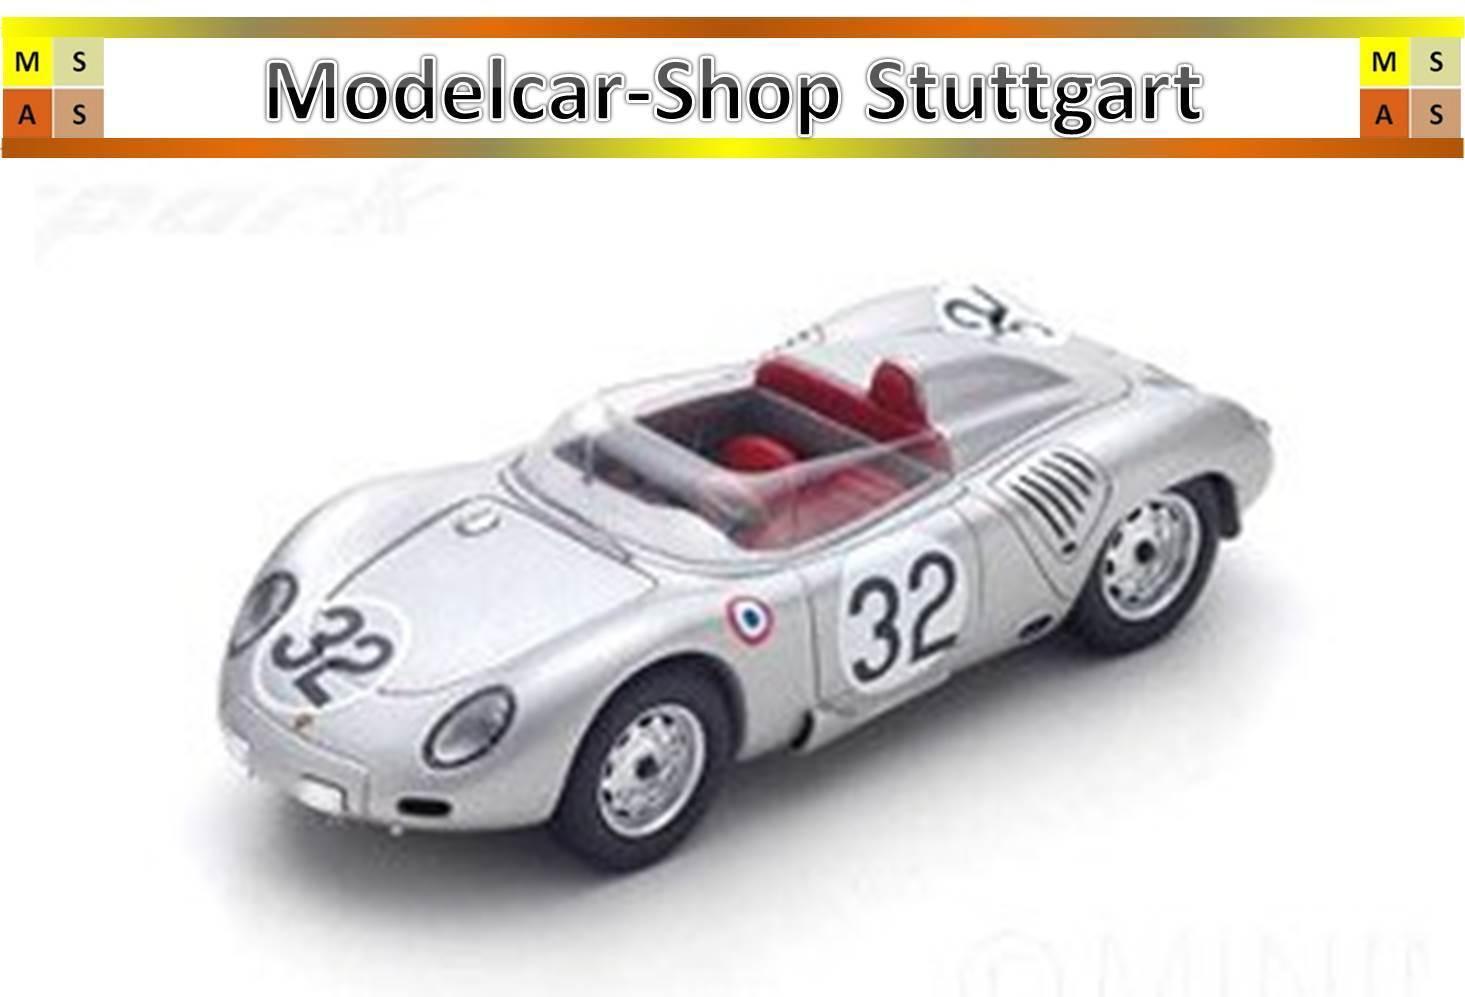 Porsche 718 Rsk No.32 Le Mans 1959 H. Herrmann - y Maglioli Spark 1 43 - S4677